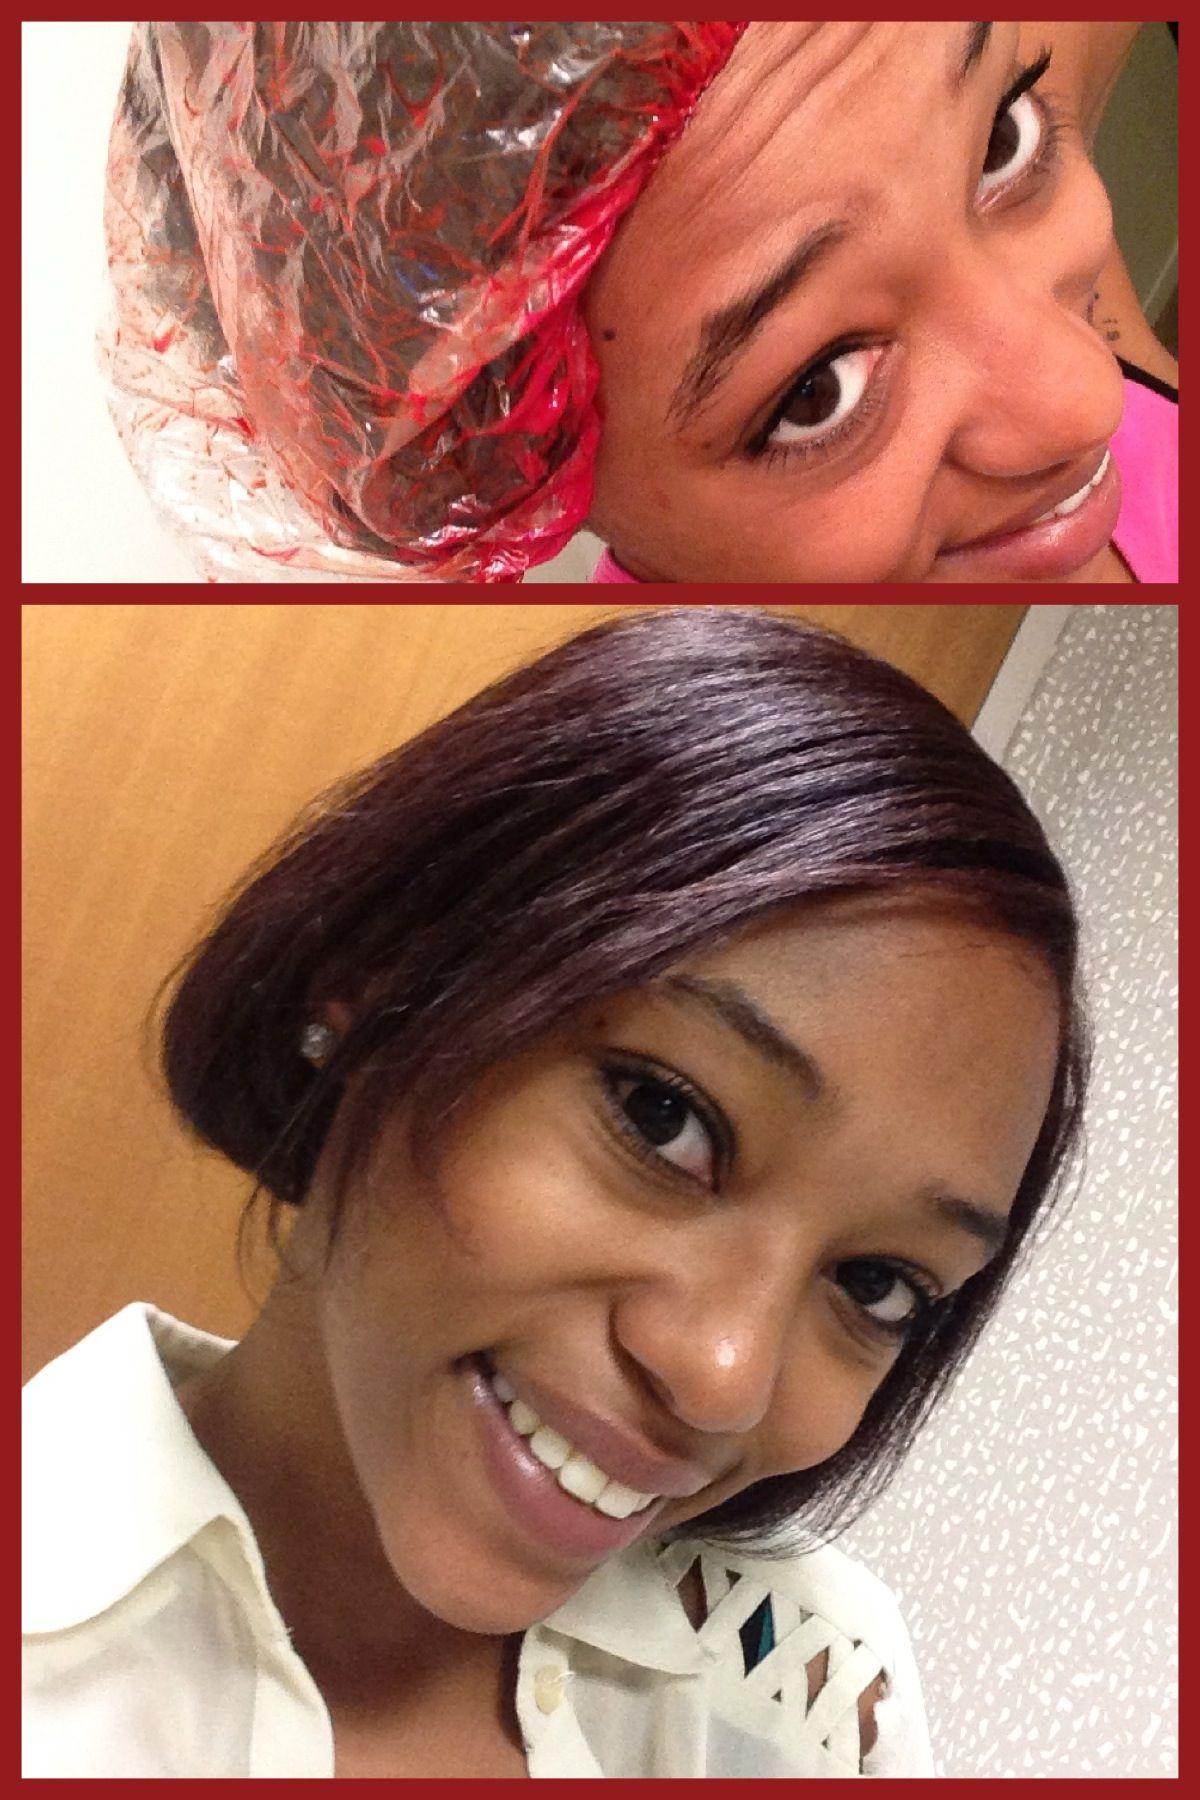 Kool Aid Hair Dye Flavors Used Tropical Punch Bright Red Black Cherry Dark Red Pure Honey Ligh Kool Aid Hair Kool Aid Hair Dye Lightening Dark Hair